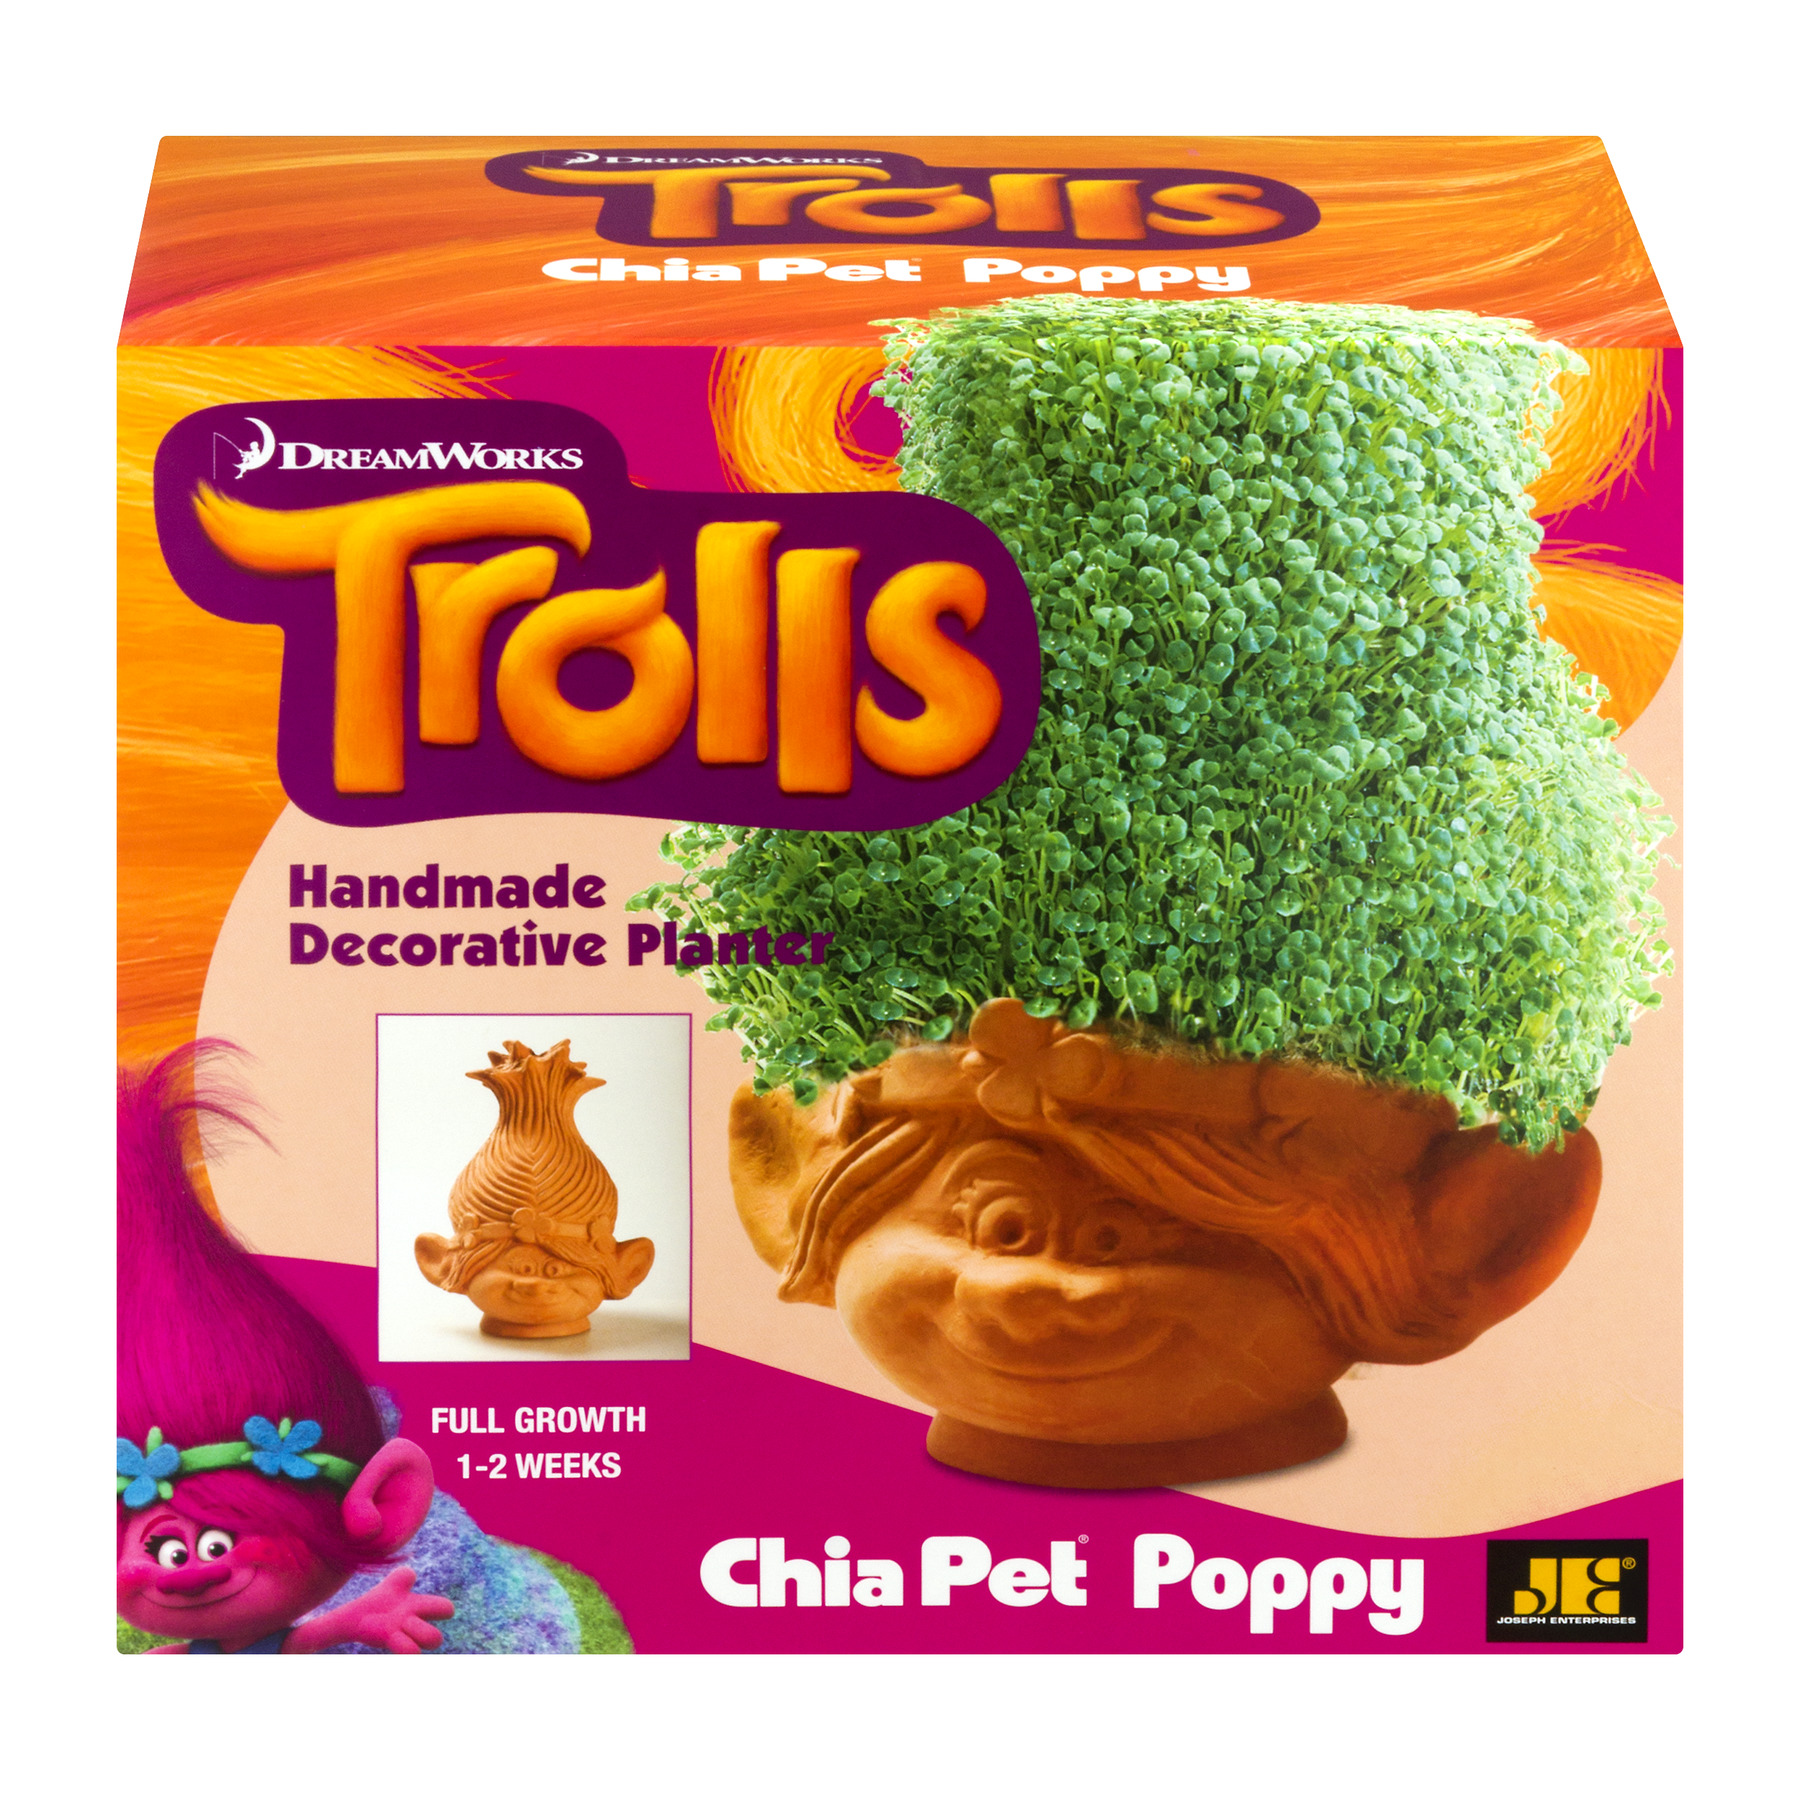 "As Seen on TV - Chia Pet ""Poppy"" Trolls - Handmade Decorative Planter"